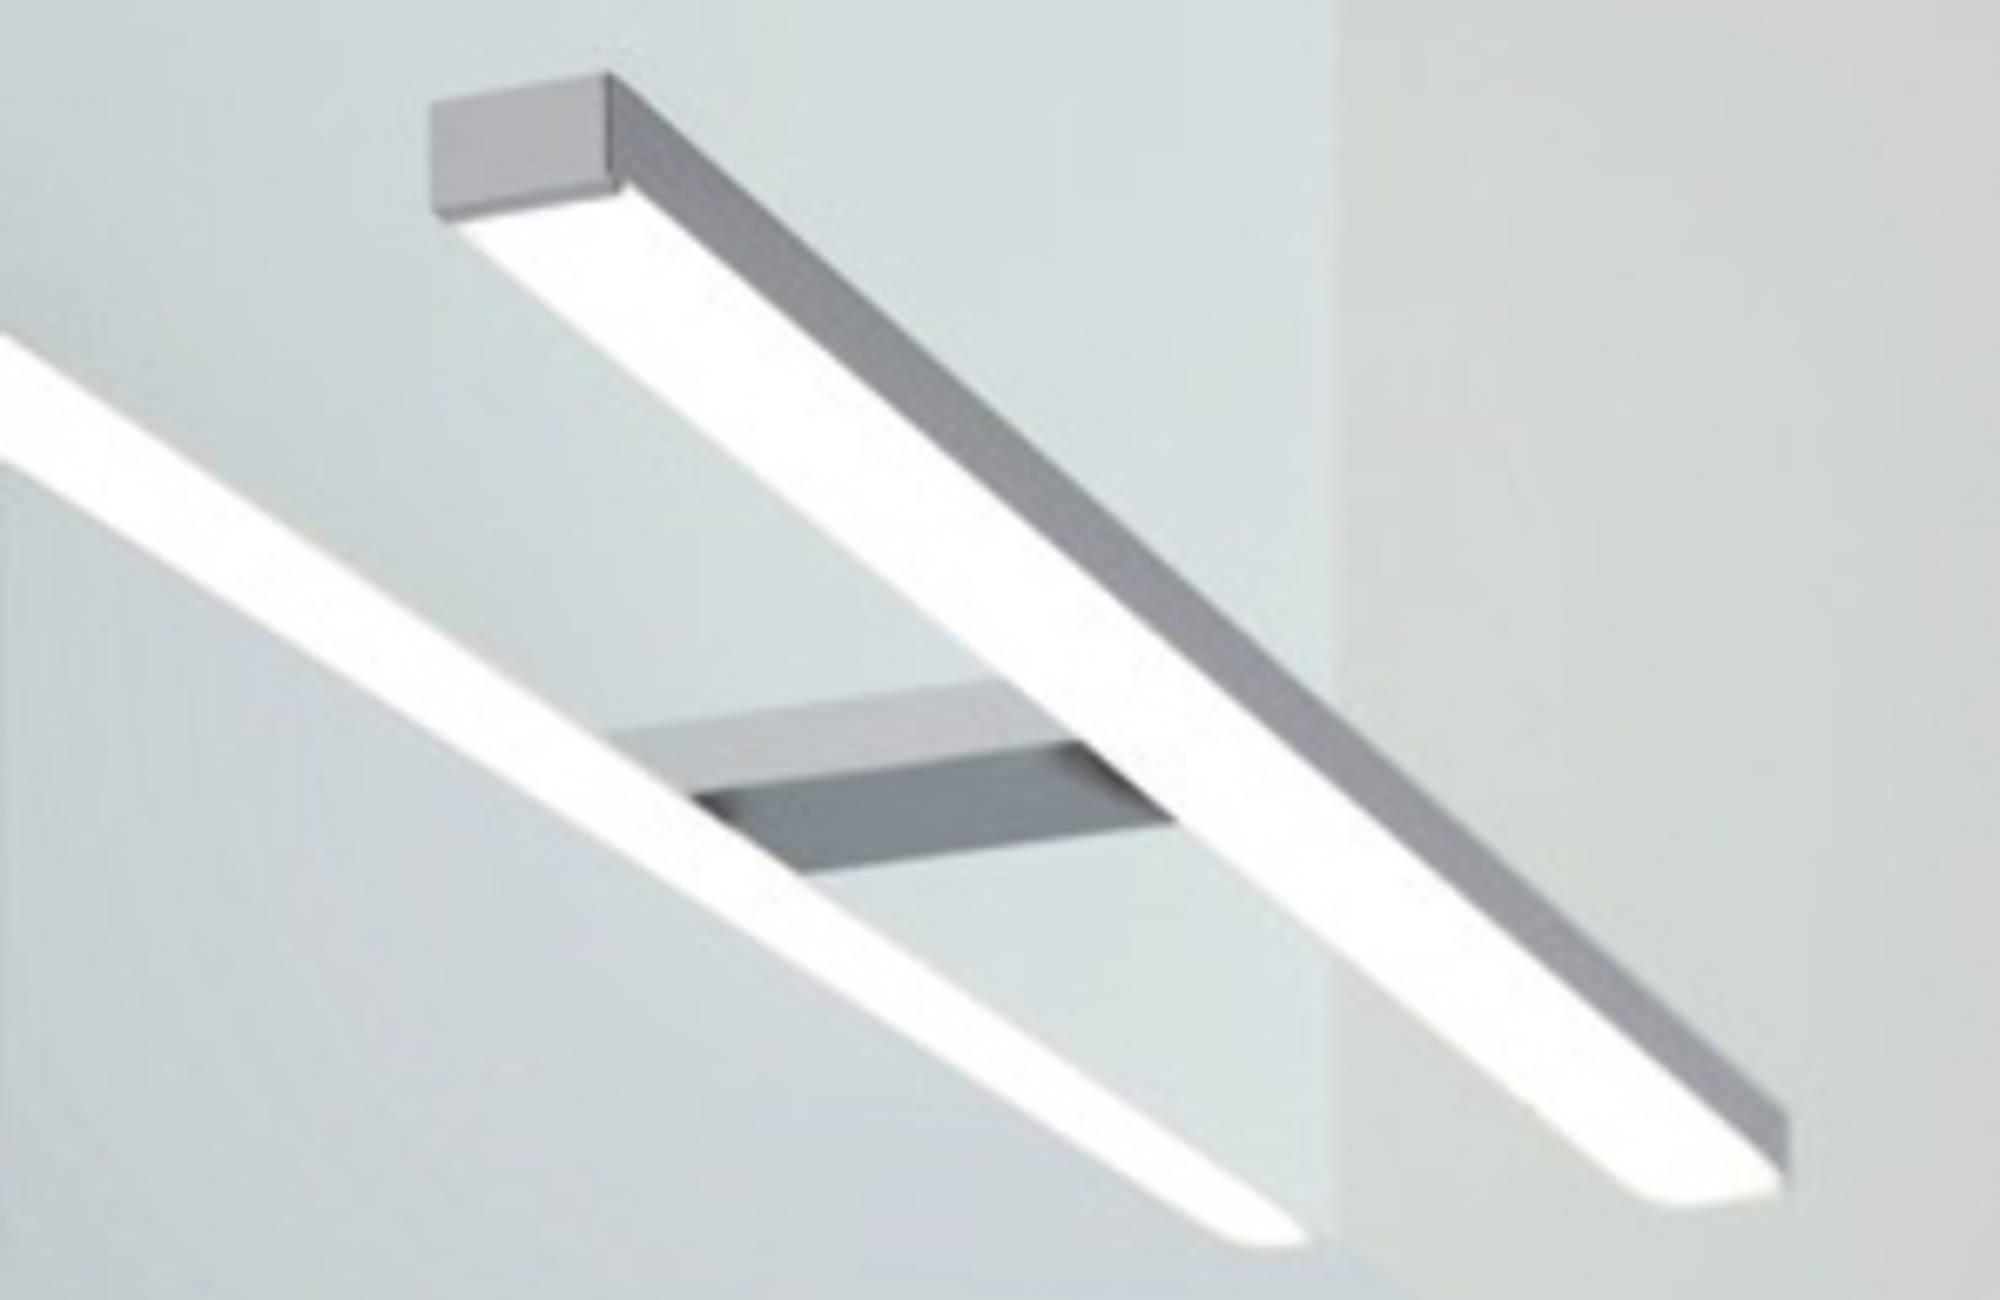 Line 45 Opbouwlamp Rechthoekig 50 cm Chroom tbv. Spiegelkast